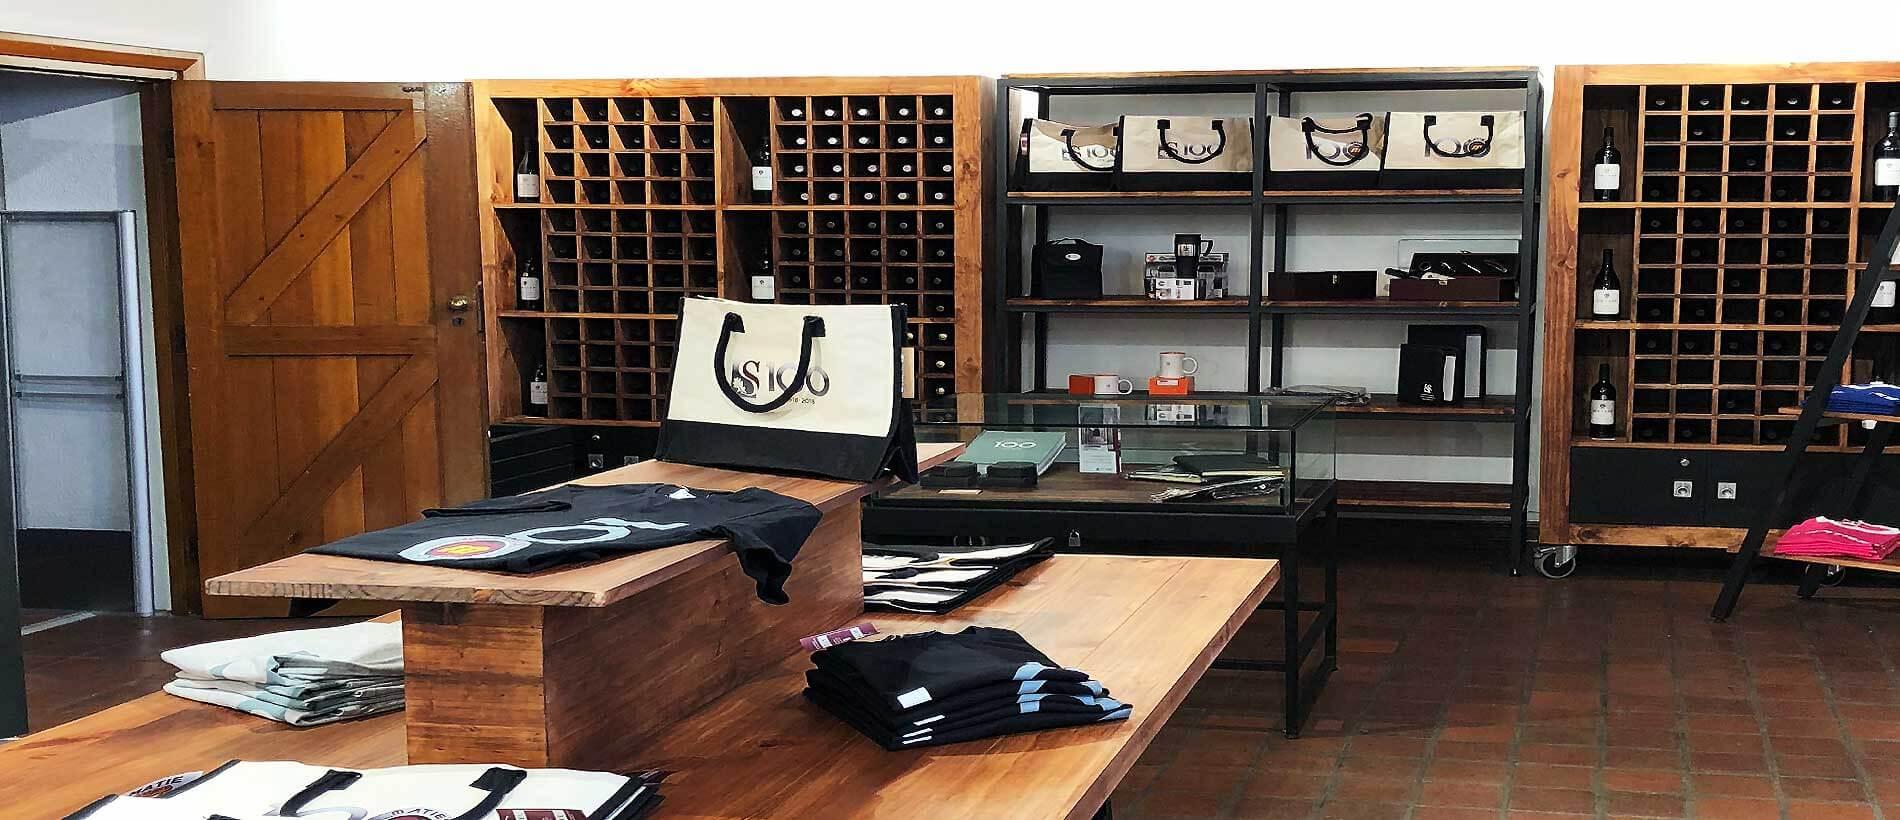 4id Retail Interior Design Shop Fitting 2